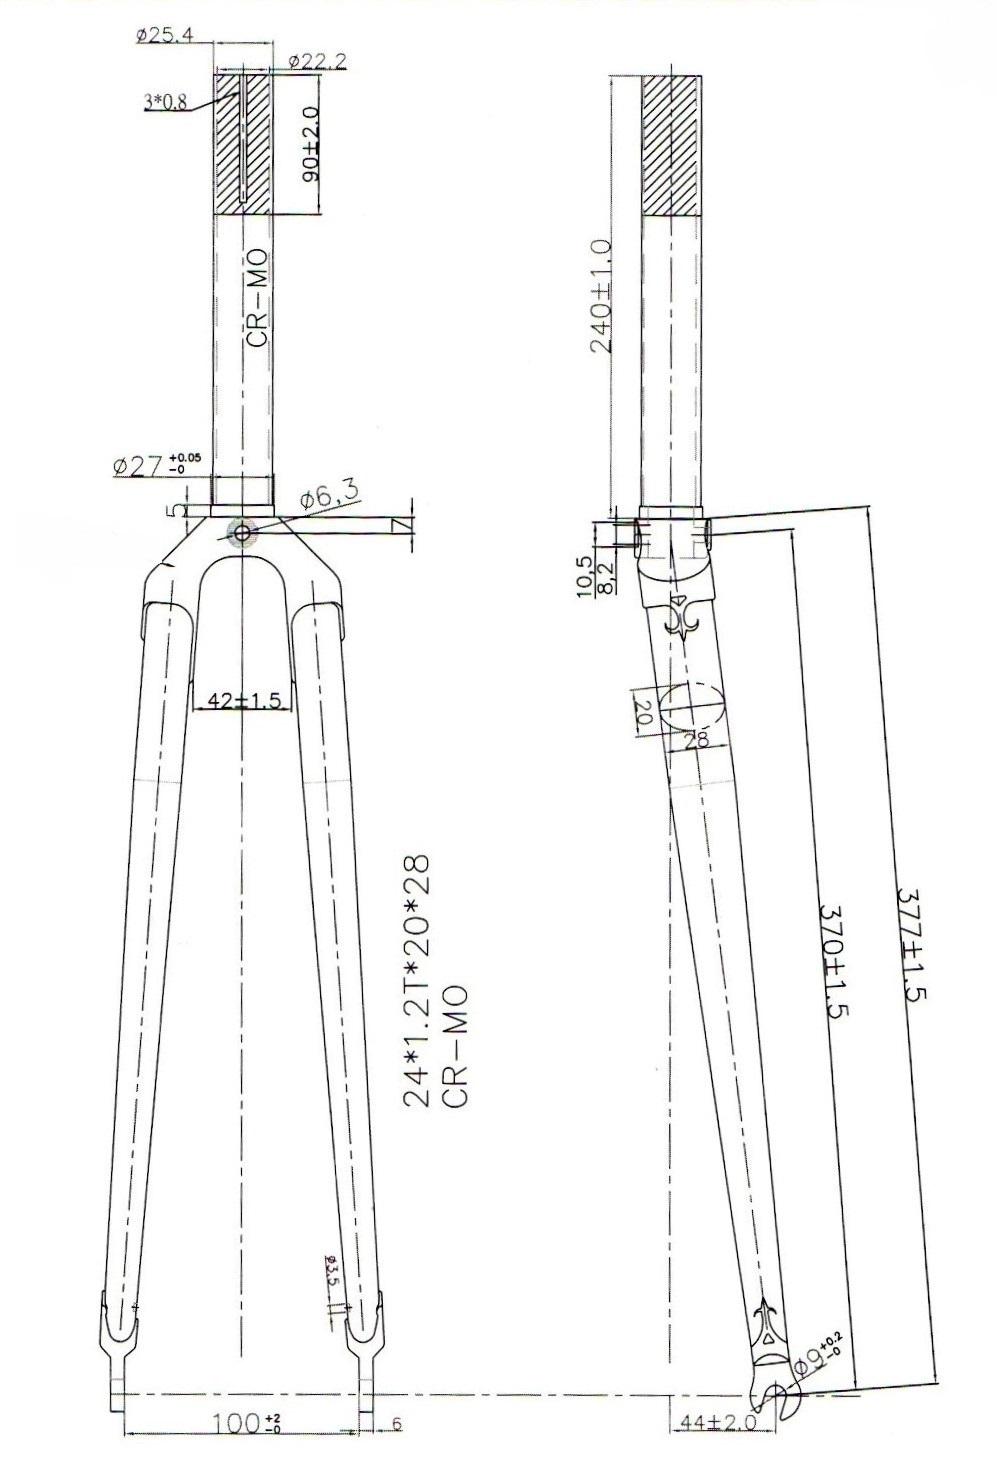 sellax-833-L5ca20da6ed520